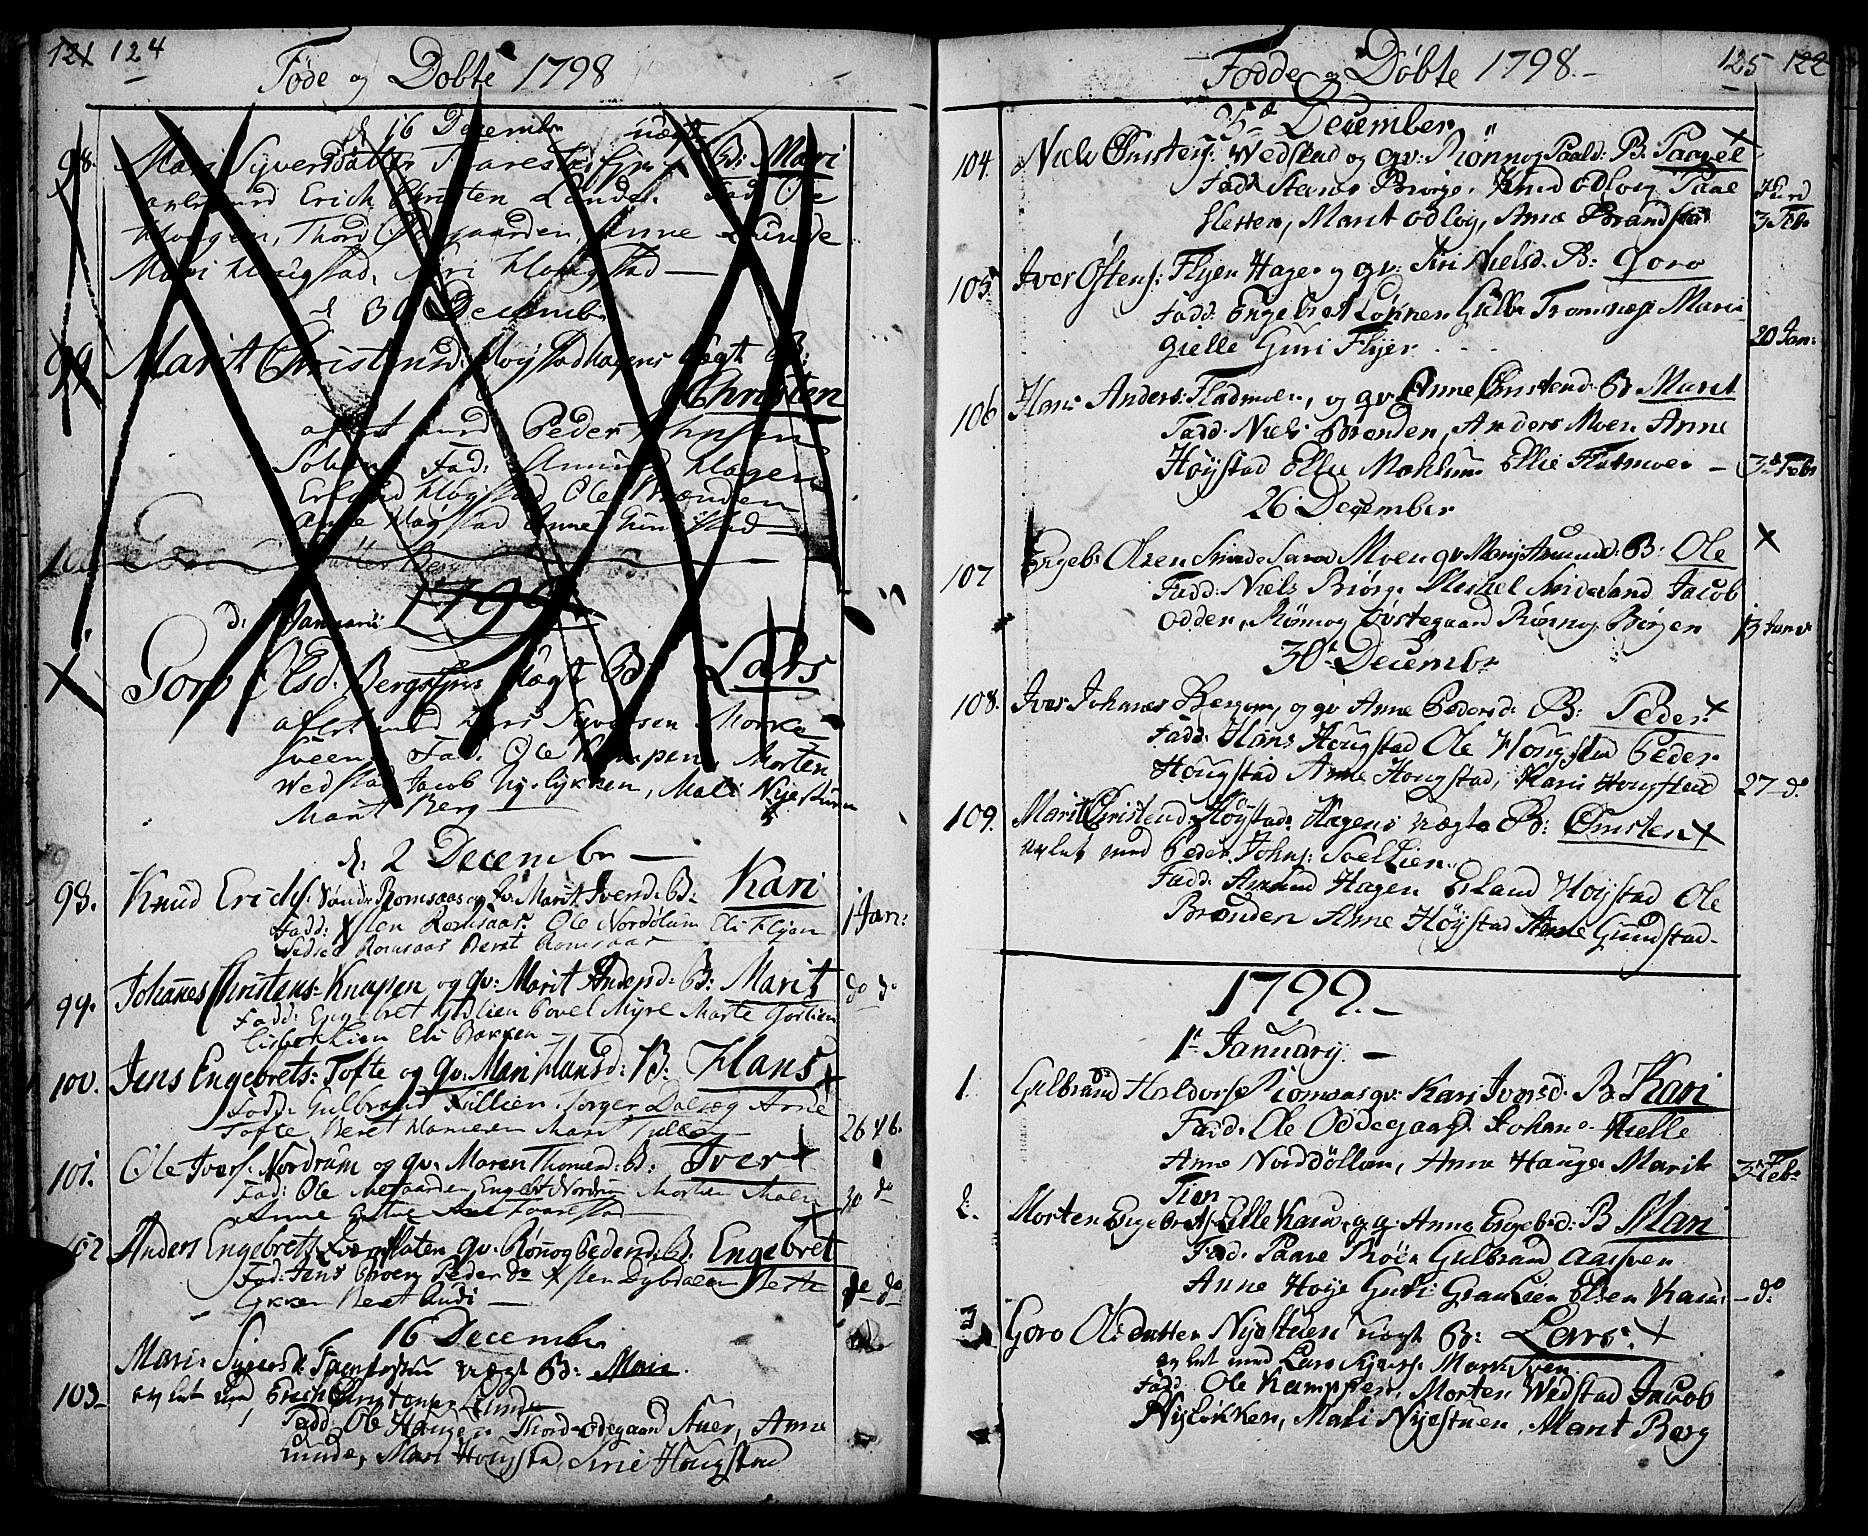 SAH, Ringebu prestekontor, Ministerialbok nr. 3, 1781-1820, s. 124-125